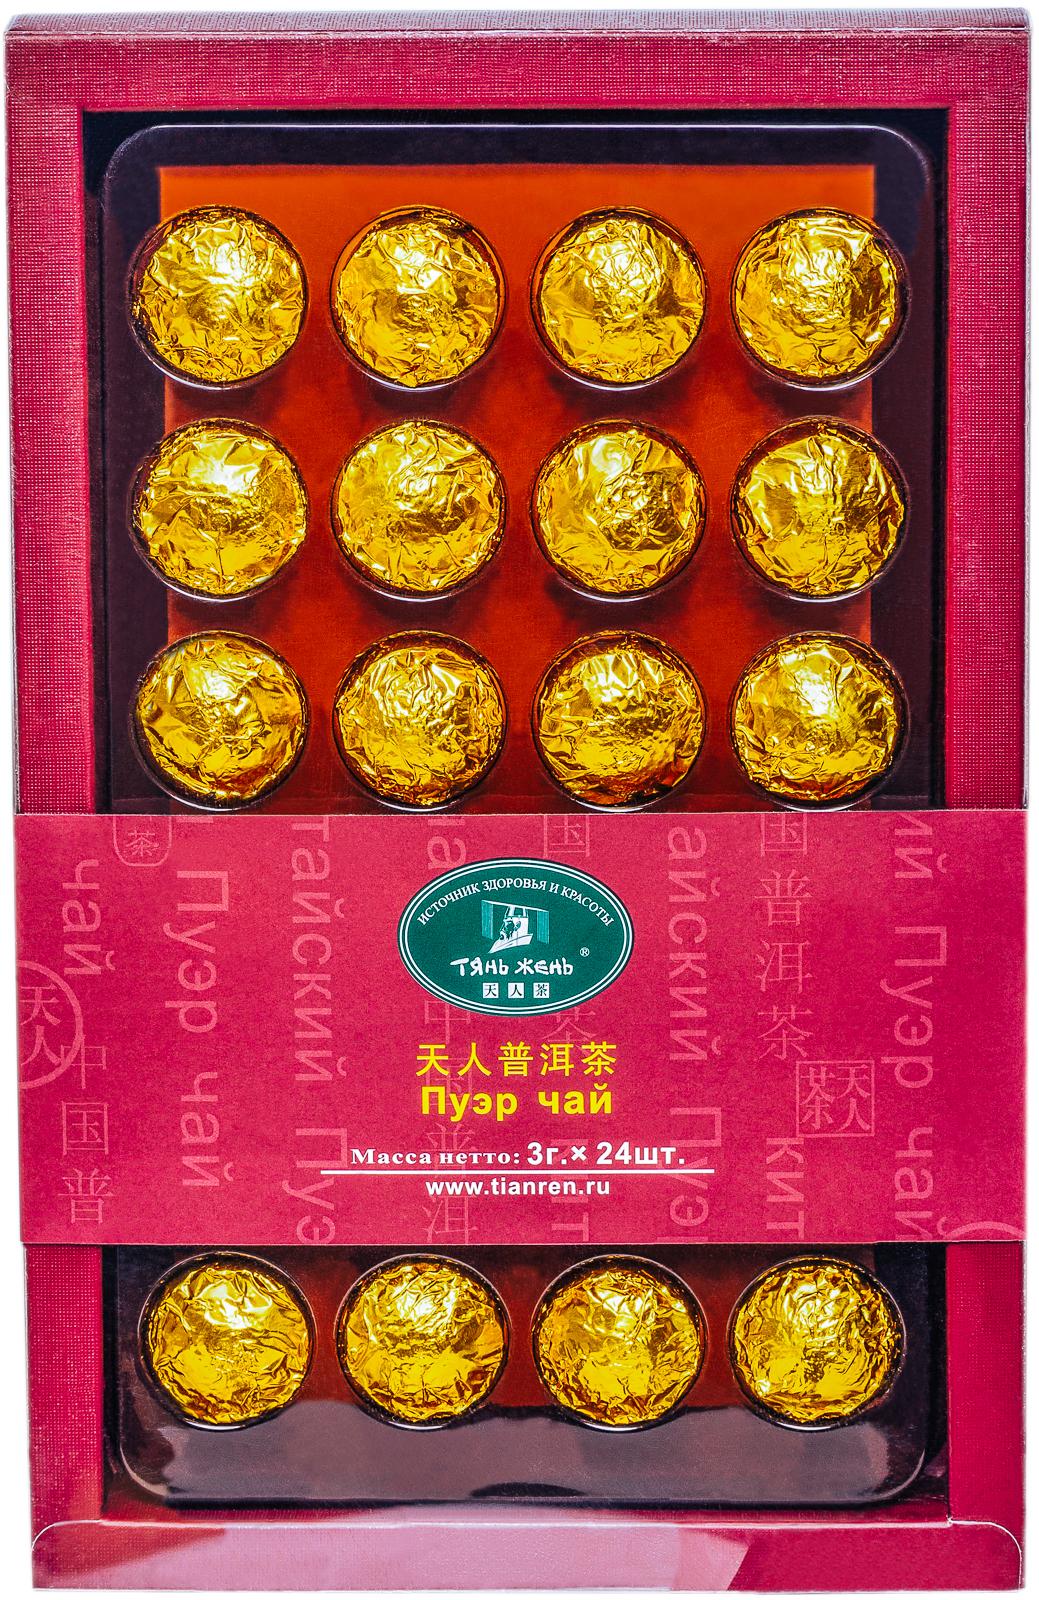 Чай листовой Тянь Жень Пуэр мини Туо Ча, 72 цена и фото